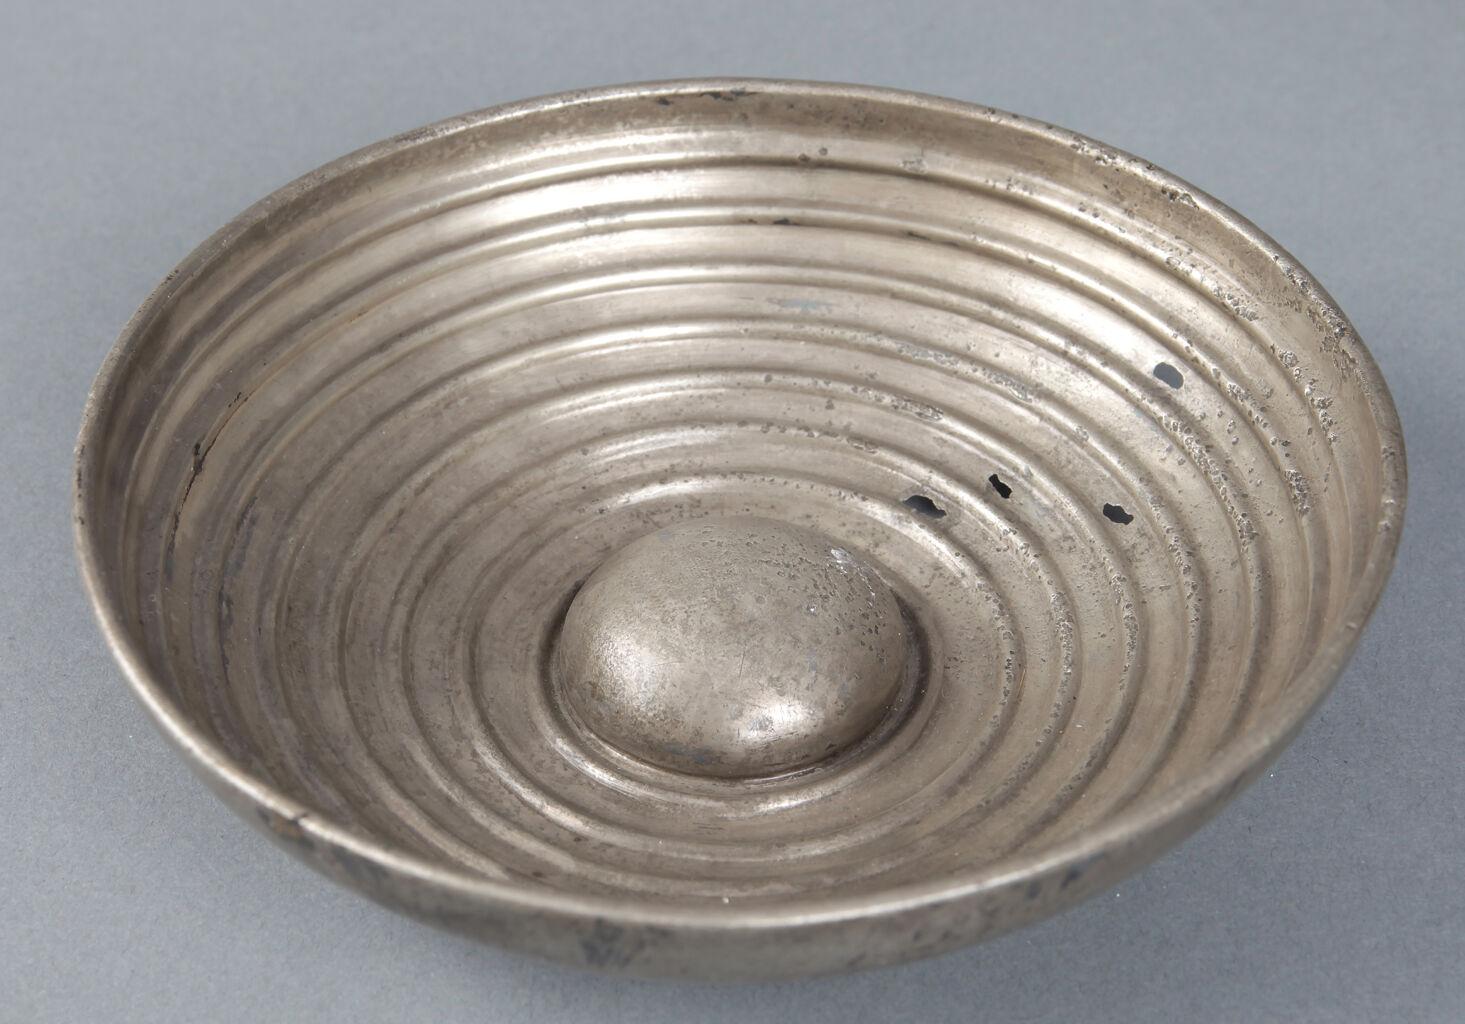 Silver omphalos bowl